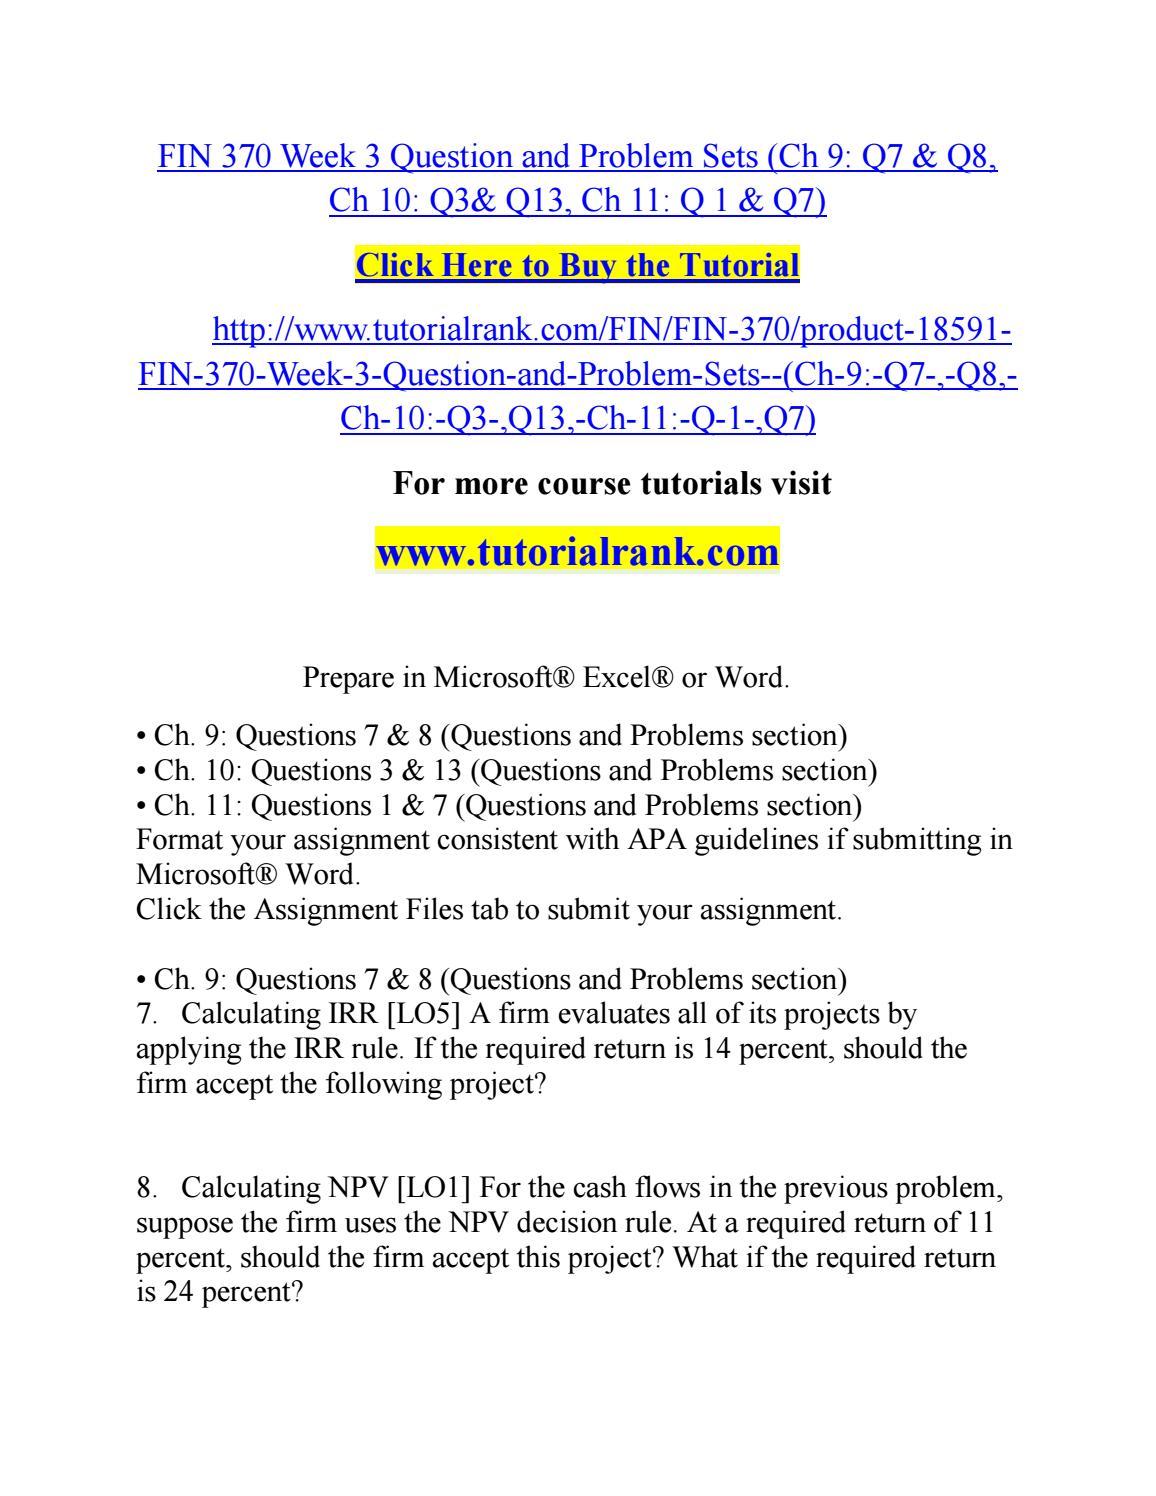 Fin 370 Week 3 Question And Problem Sets Ch 9 Q7 Q8 Ch 10 Q3